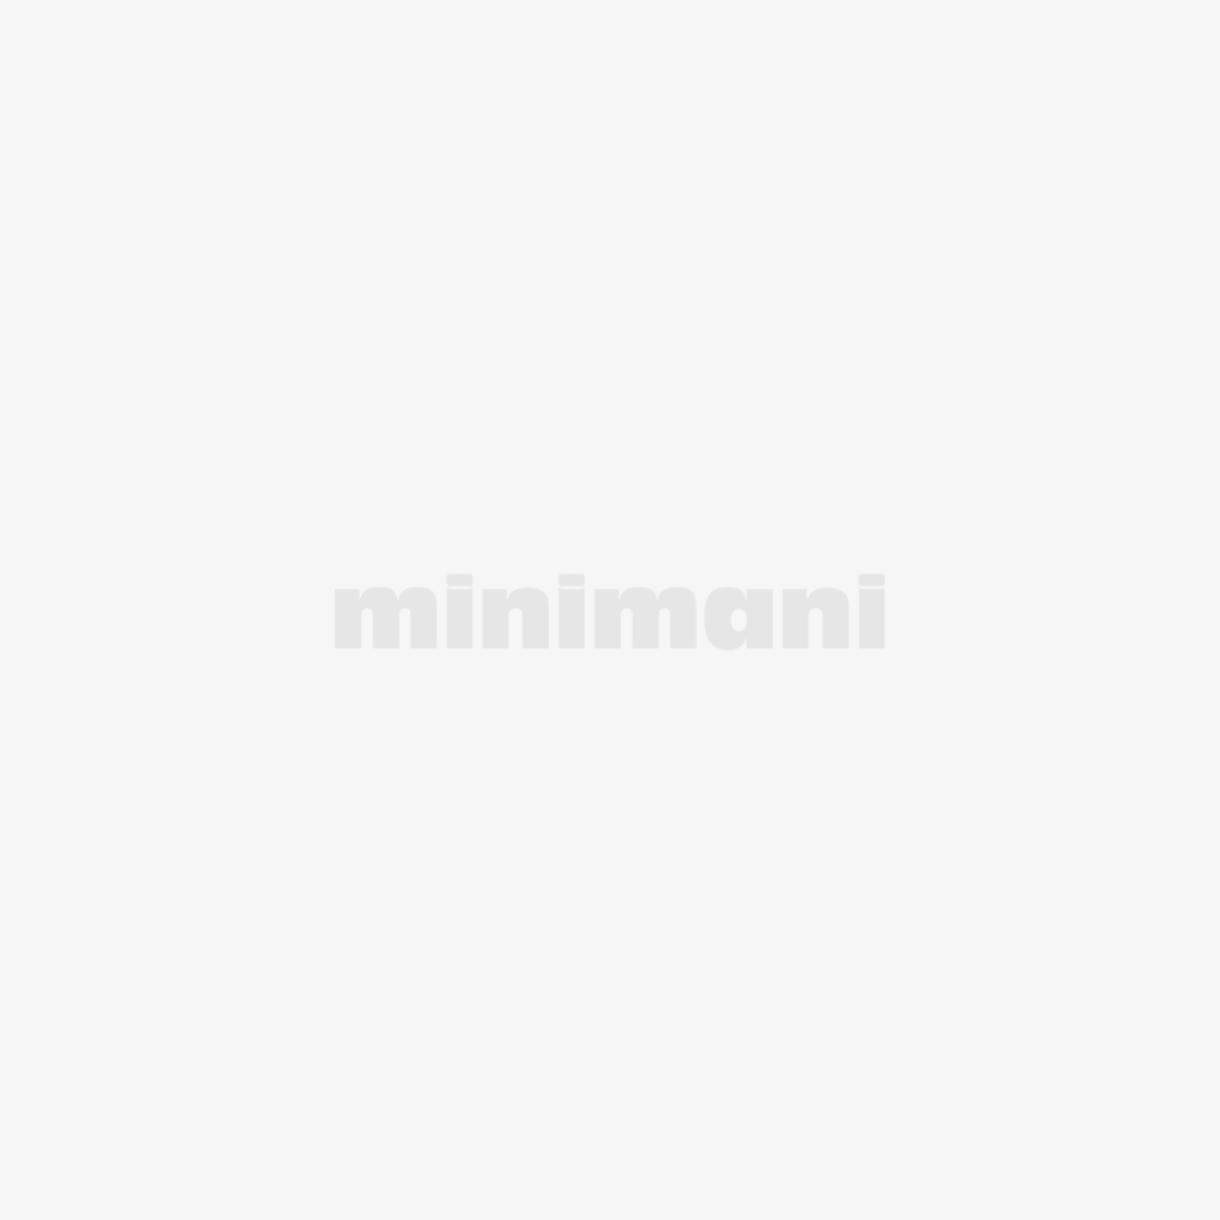 FINNWEAR NAISTEN PITKIKSET, BAMBU L 1210 SORT